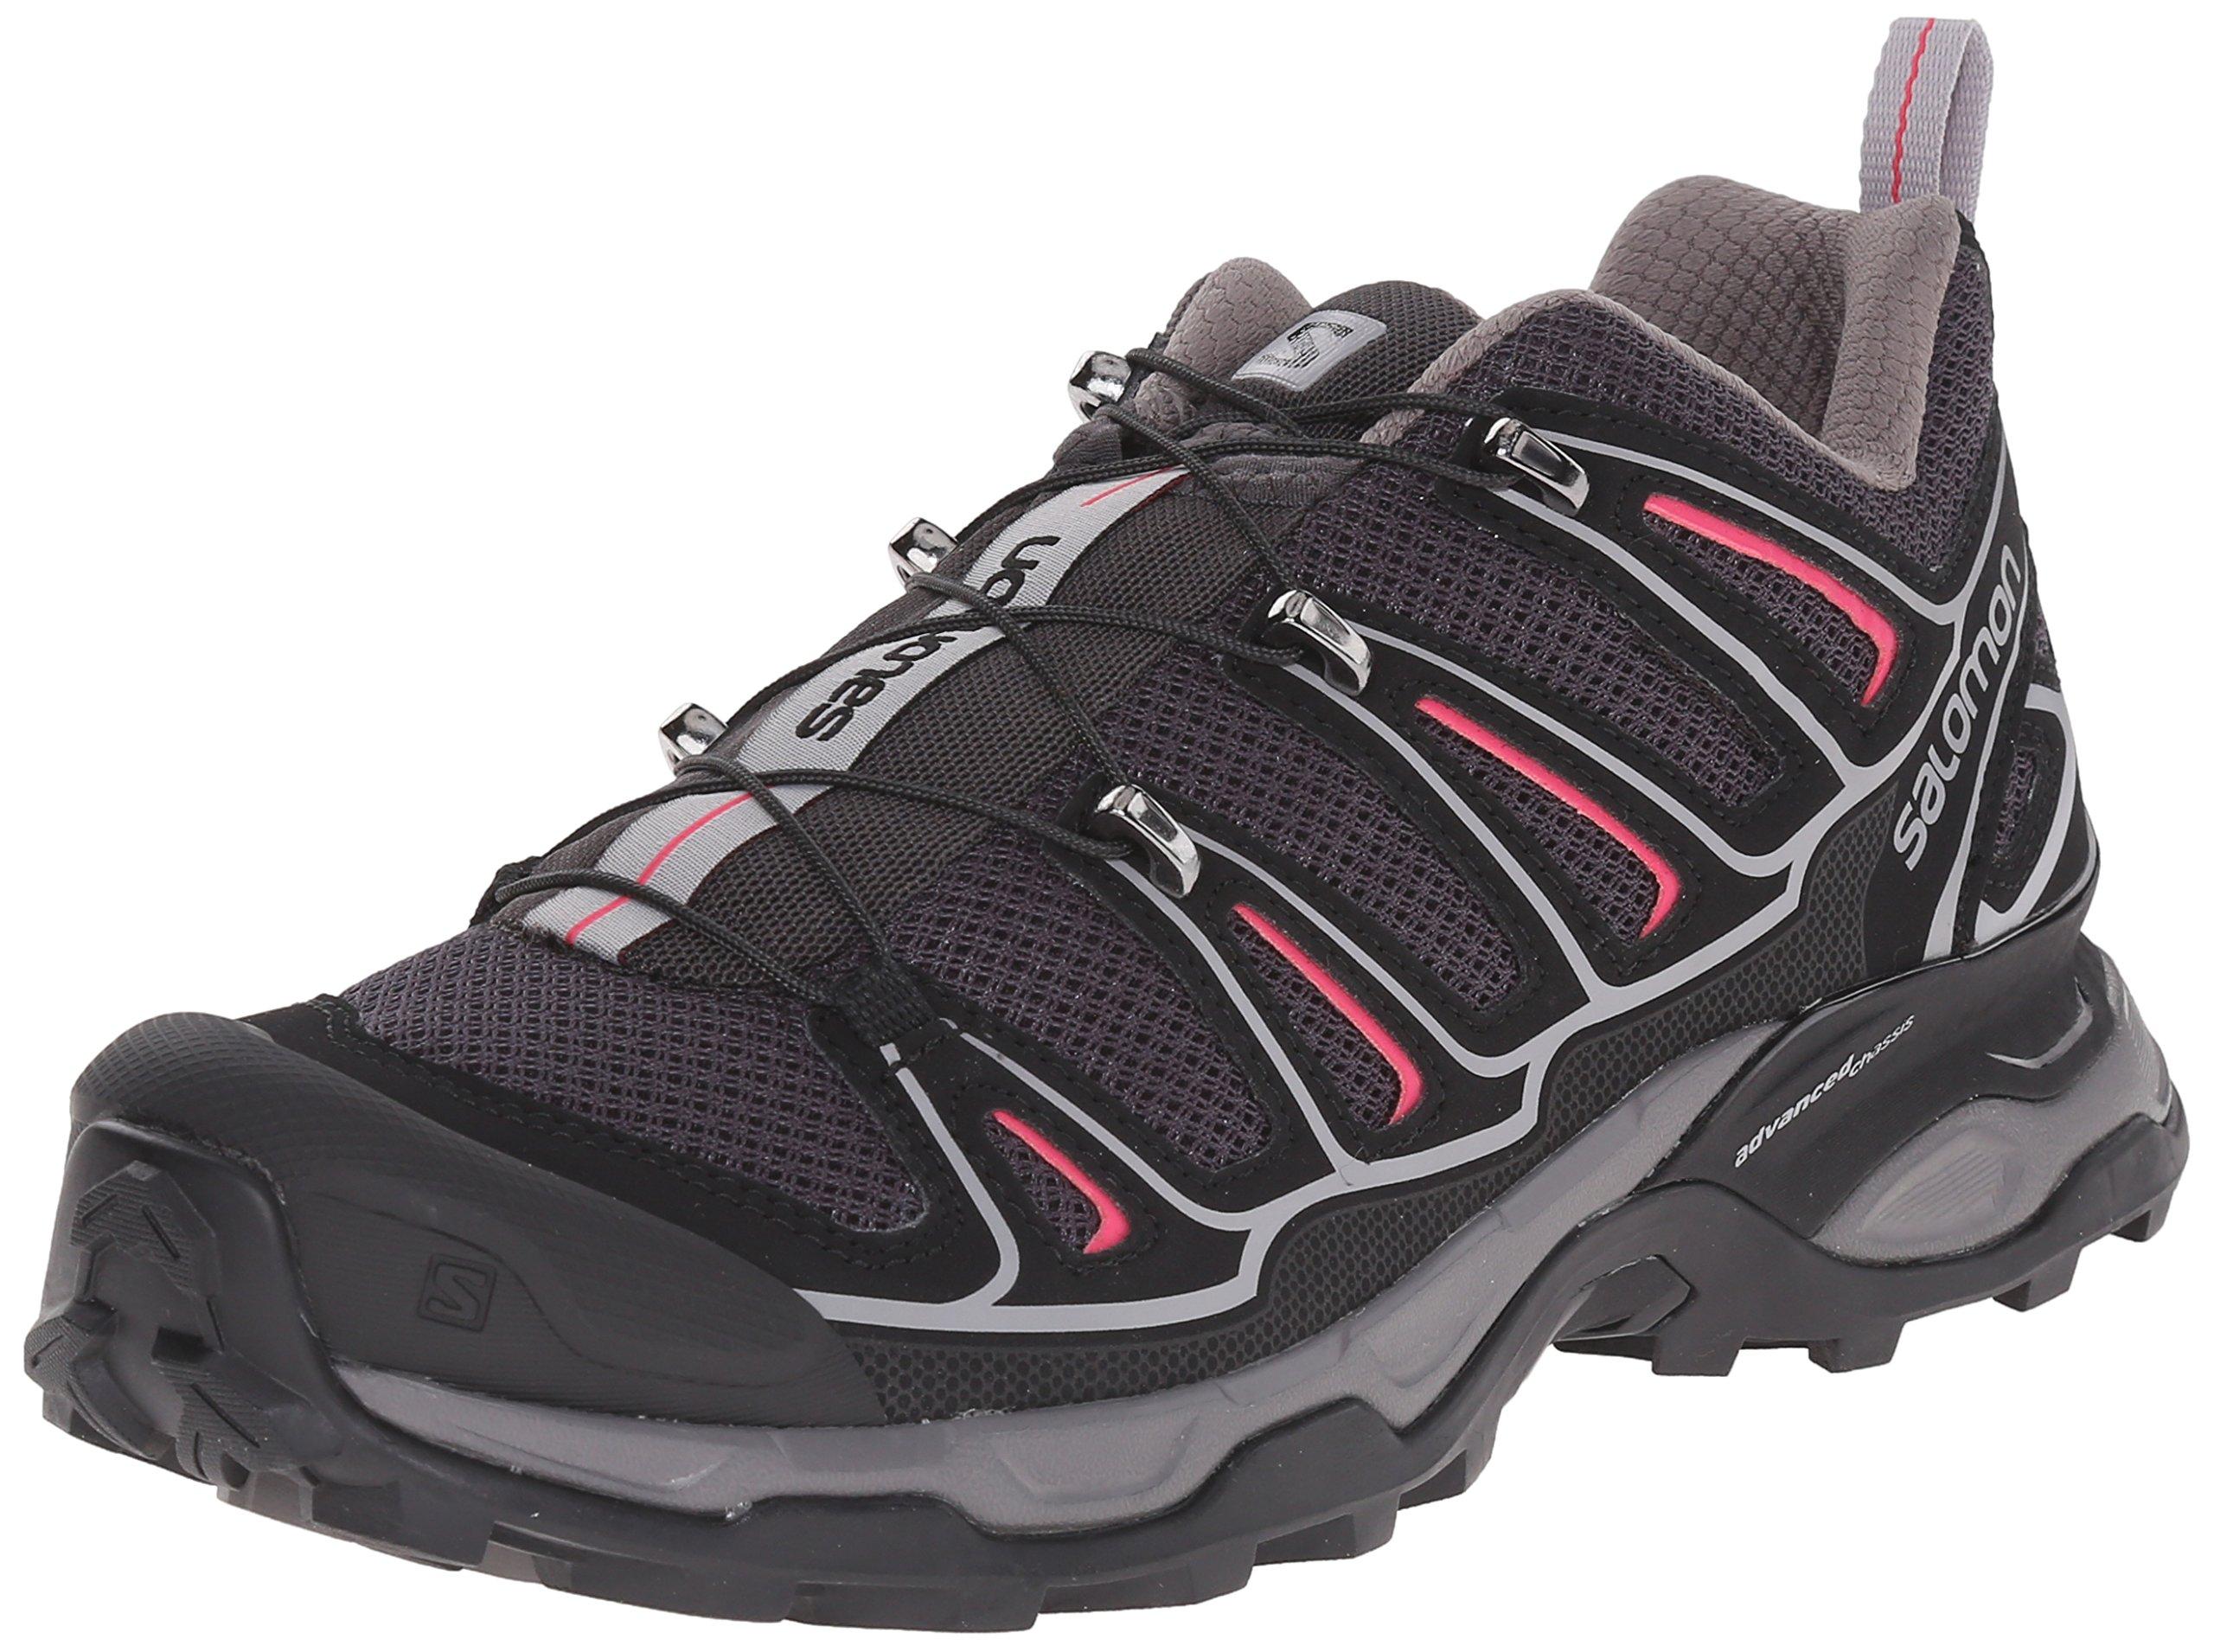 Salomon Women's X Ultra 2 W Hiking Shoe, Asphalt/Black/Hot Pink, 7.5 B US